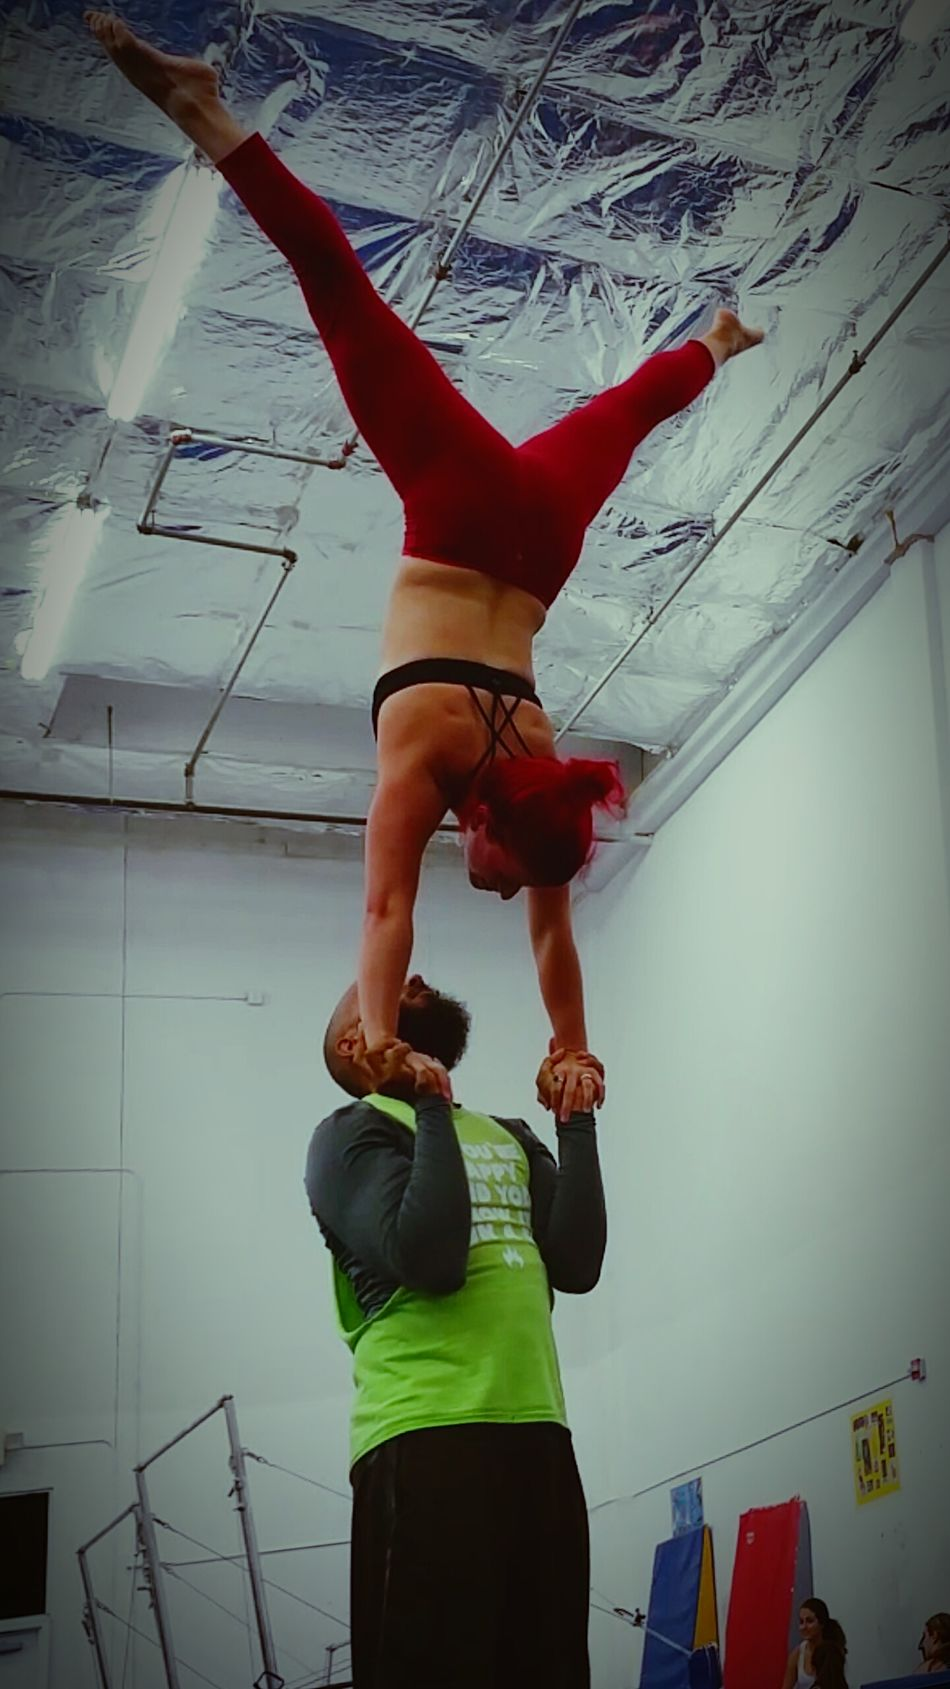 Acroyoga Cirque Circus when you don't go to a regular gym, this happens!